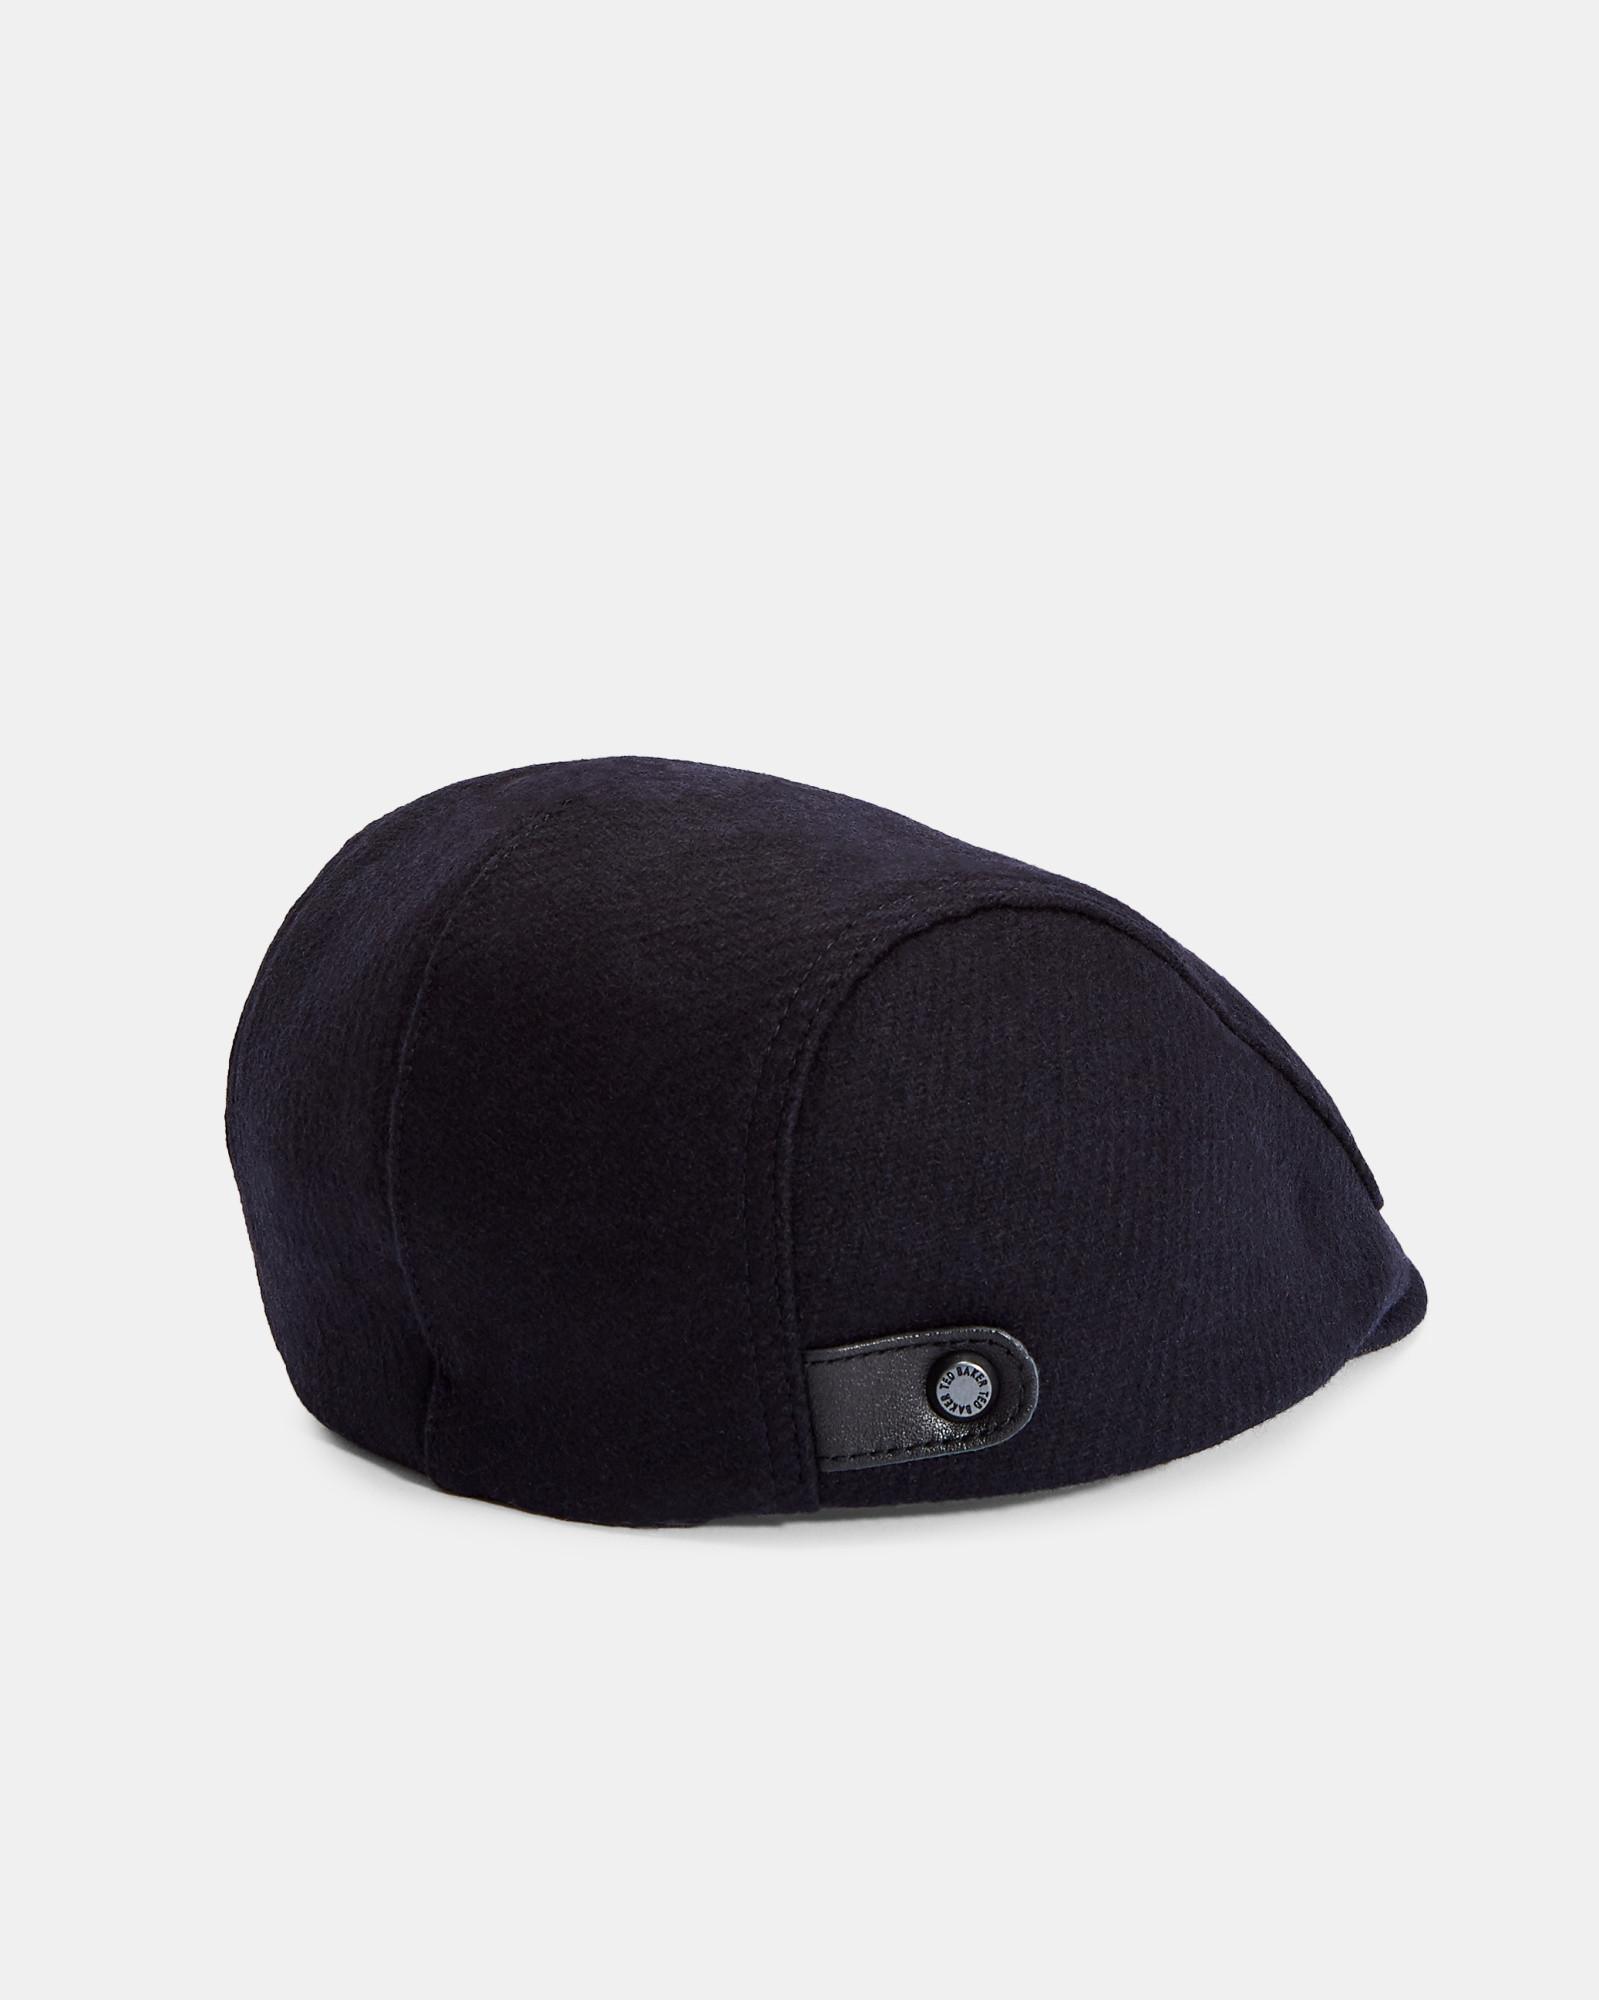 Ted Baker Wool Flat Cap in Blue for Men - Lyst 9b57b2dc63c6